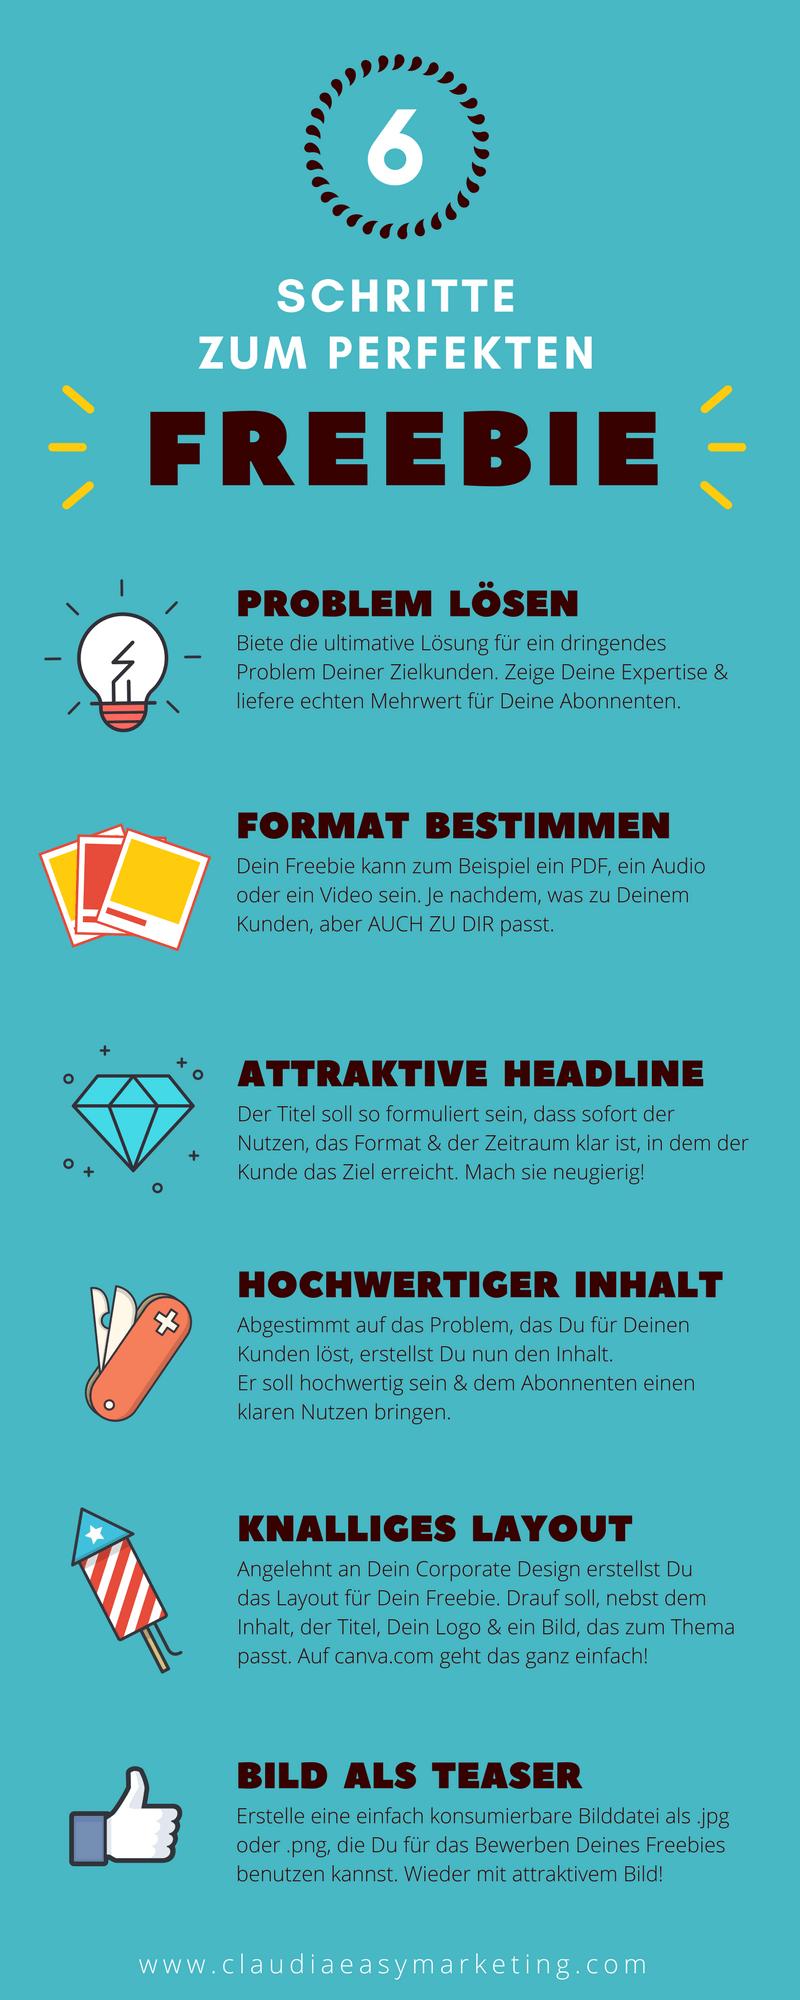 6 Schritte zum perfekten Freebie - Infografik